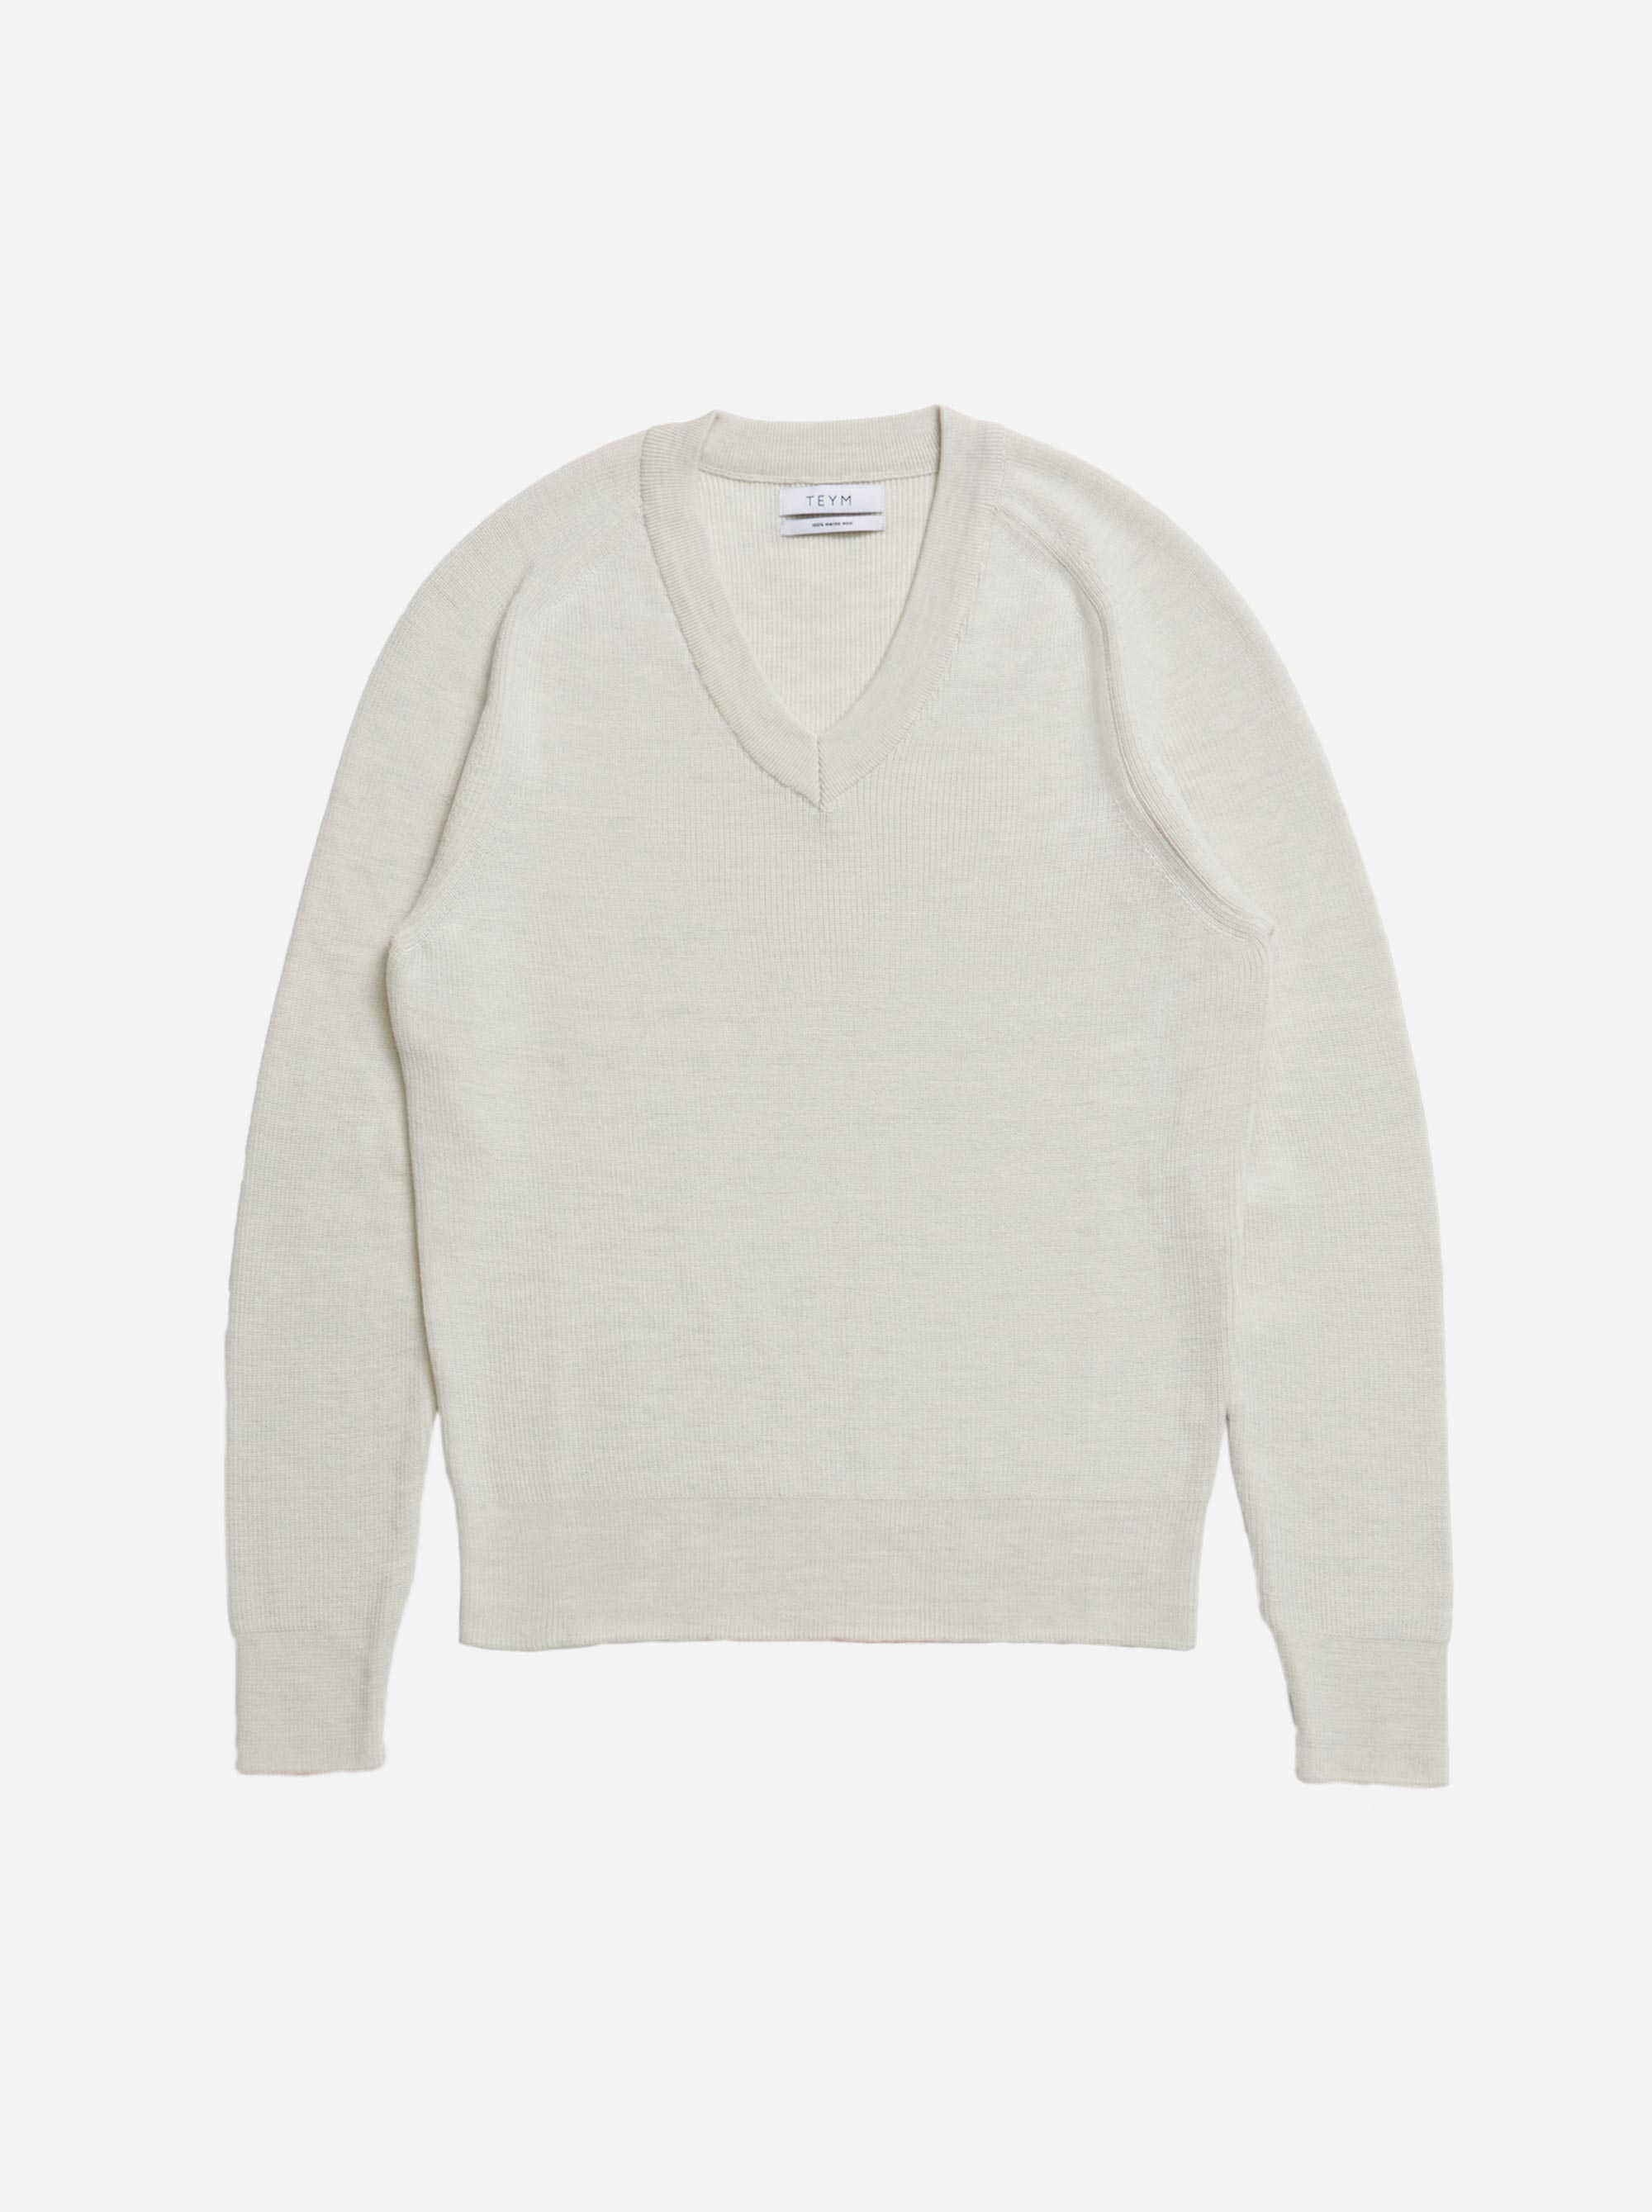 Teym - V-Neck - The Merino Sweater - Women - White - 4